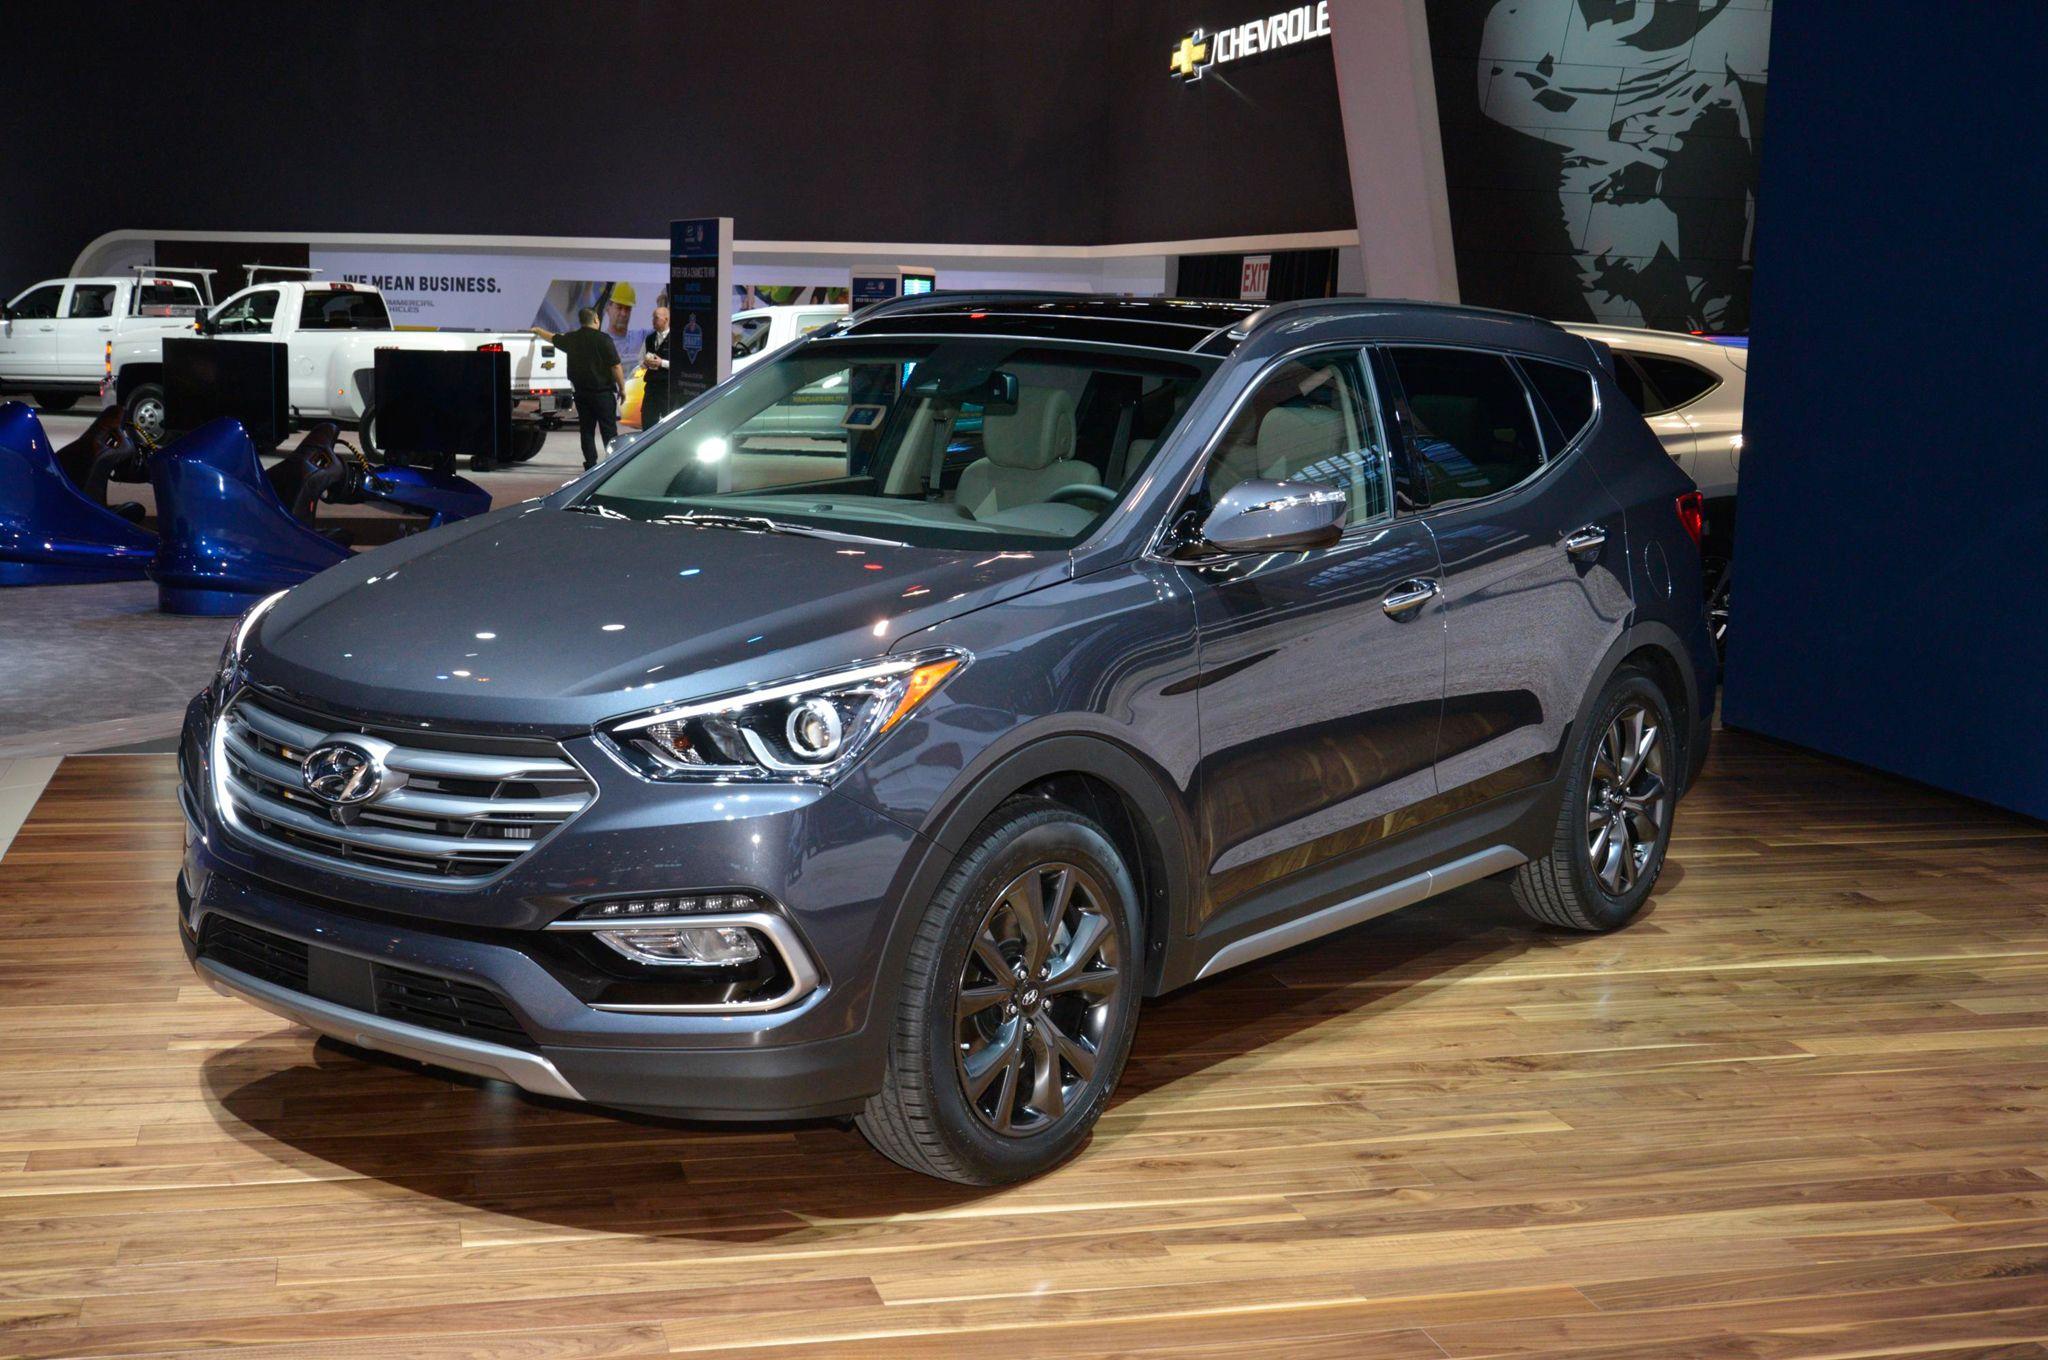 2017 Hyundai Santa Fe Specs Price Affordable Http Pistoncars